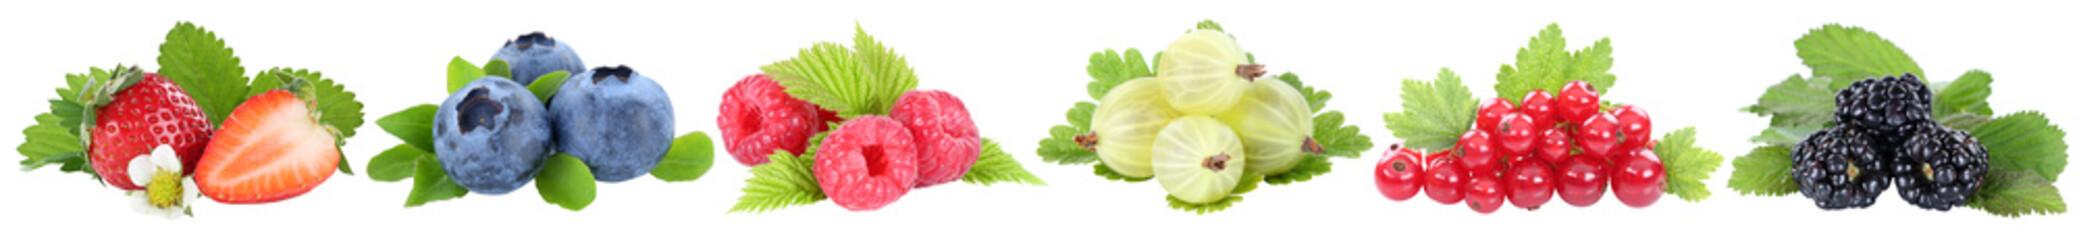 Sammlung Beeren Erdbeeren Blaubeeren Himbeeren rote Johannisbeeren Früchte in einer Reihe isoliert Freisteller freigestellt